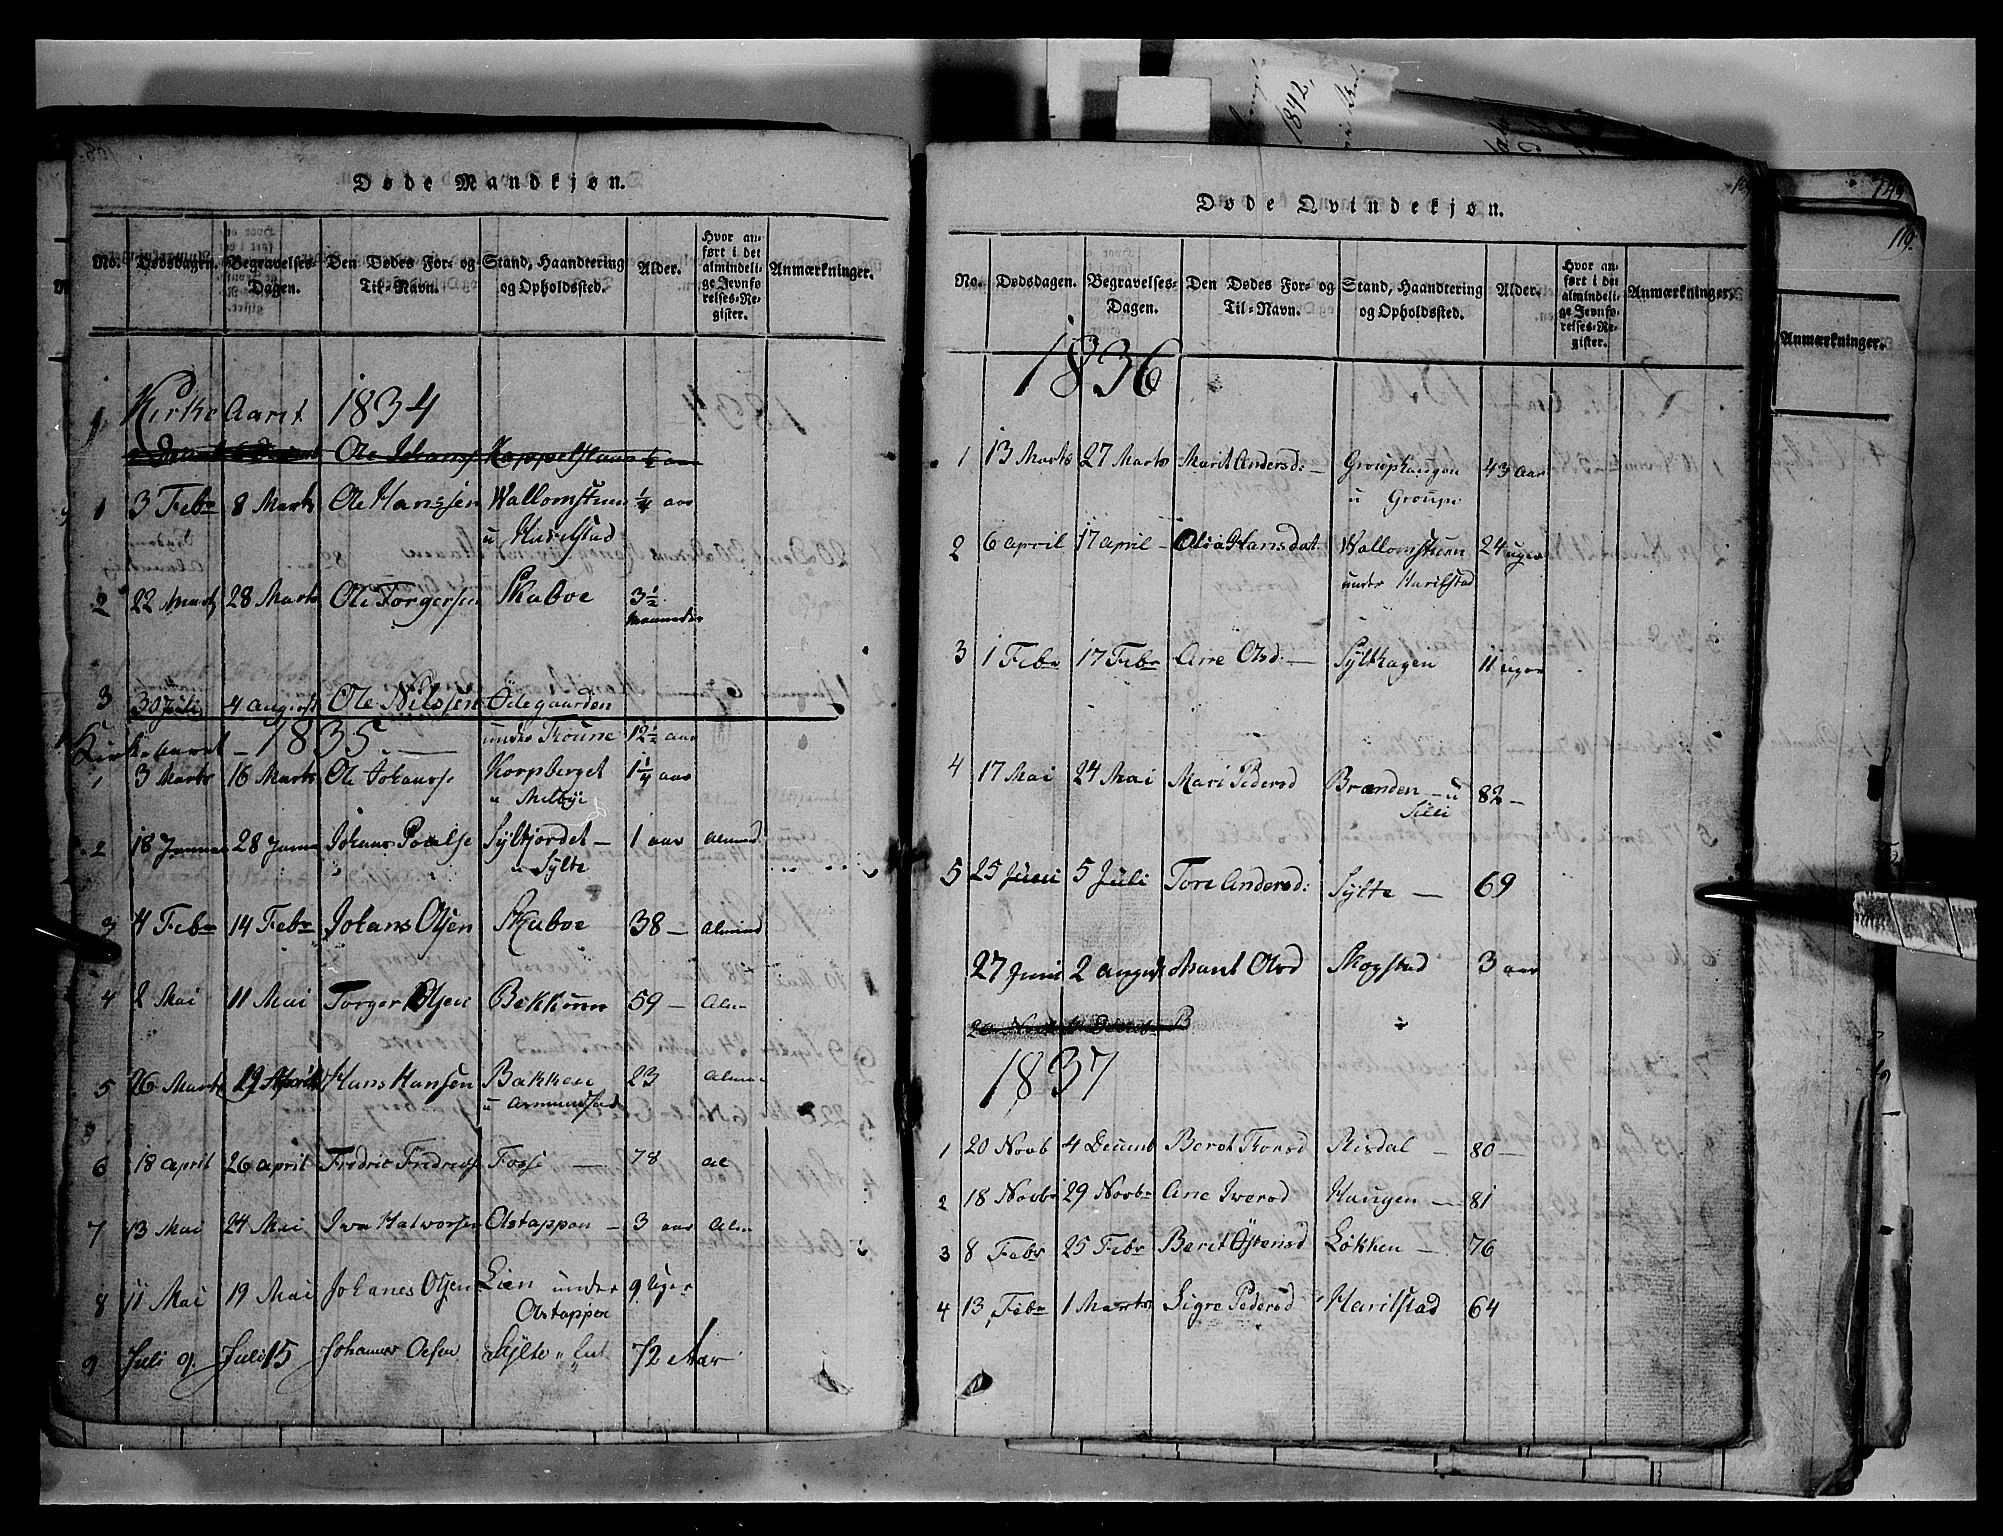 SAH, Fron prestekontor, H/Ha/Hab/L0003: Klokkerbok nr. 3, 1816-1850, s. 109